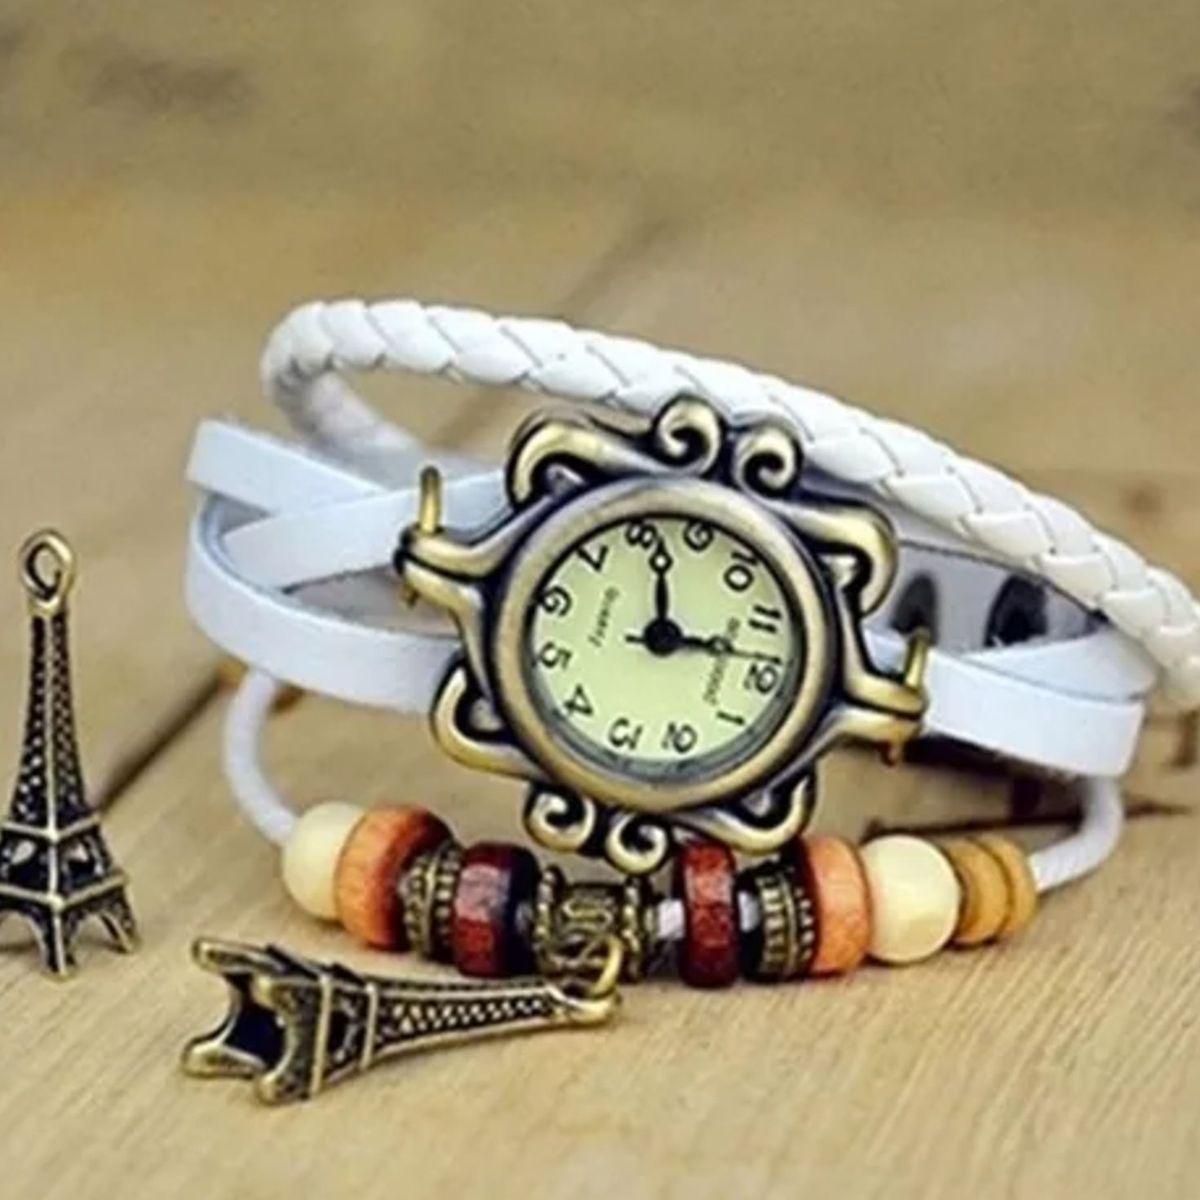 b1bbfab676b Relógio Pulseira de Couro com Pingente Vintage Feminino Branco Torre Eiffel